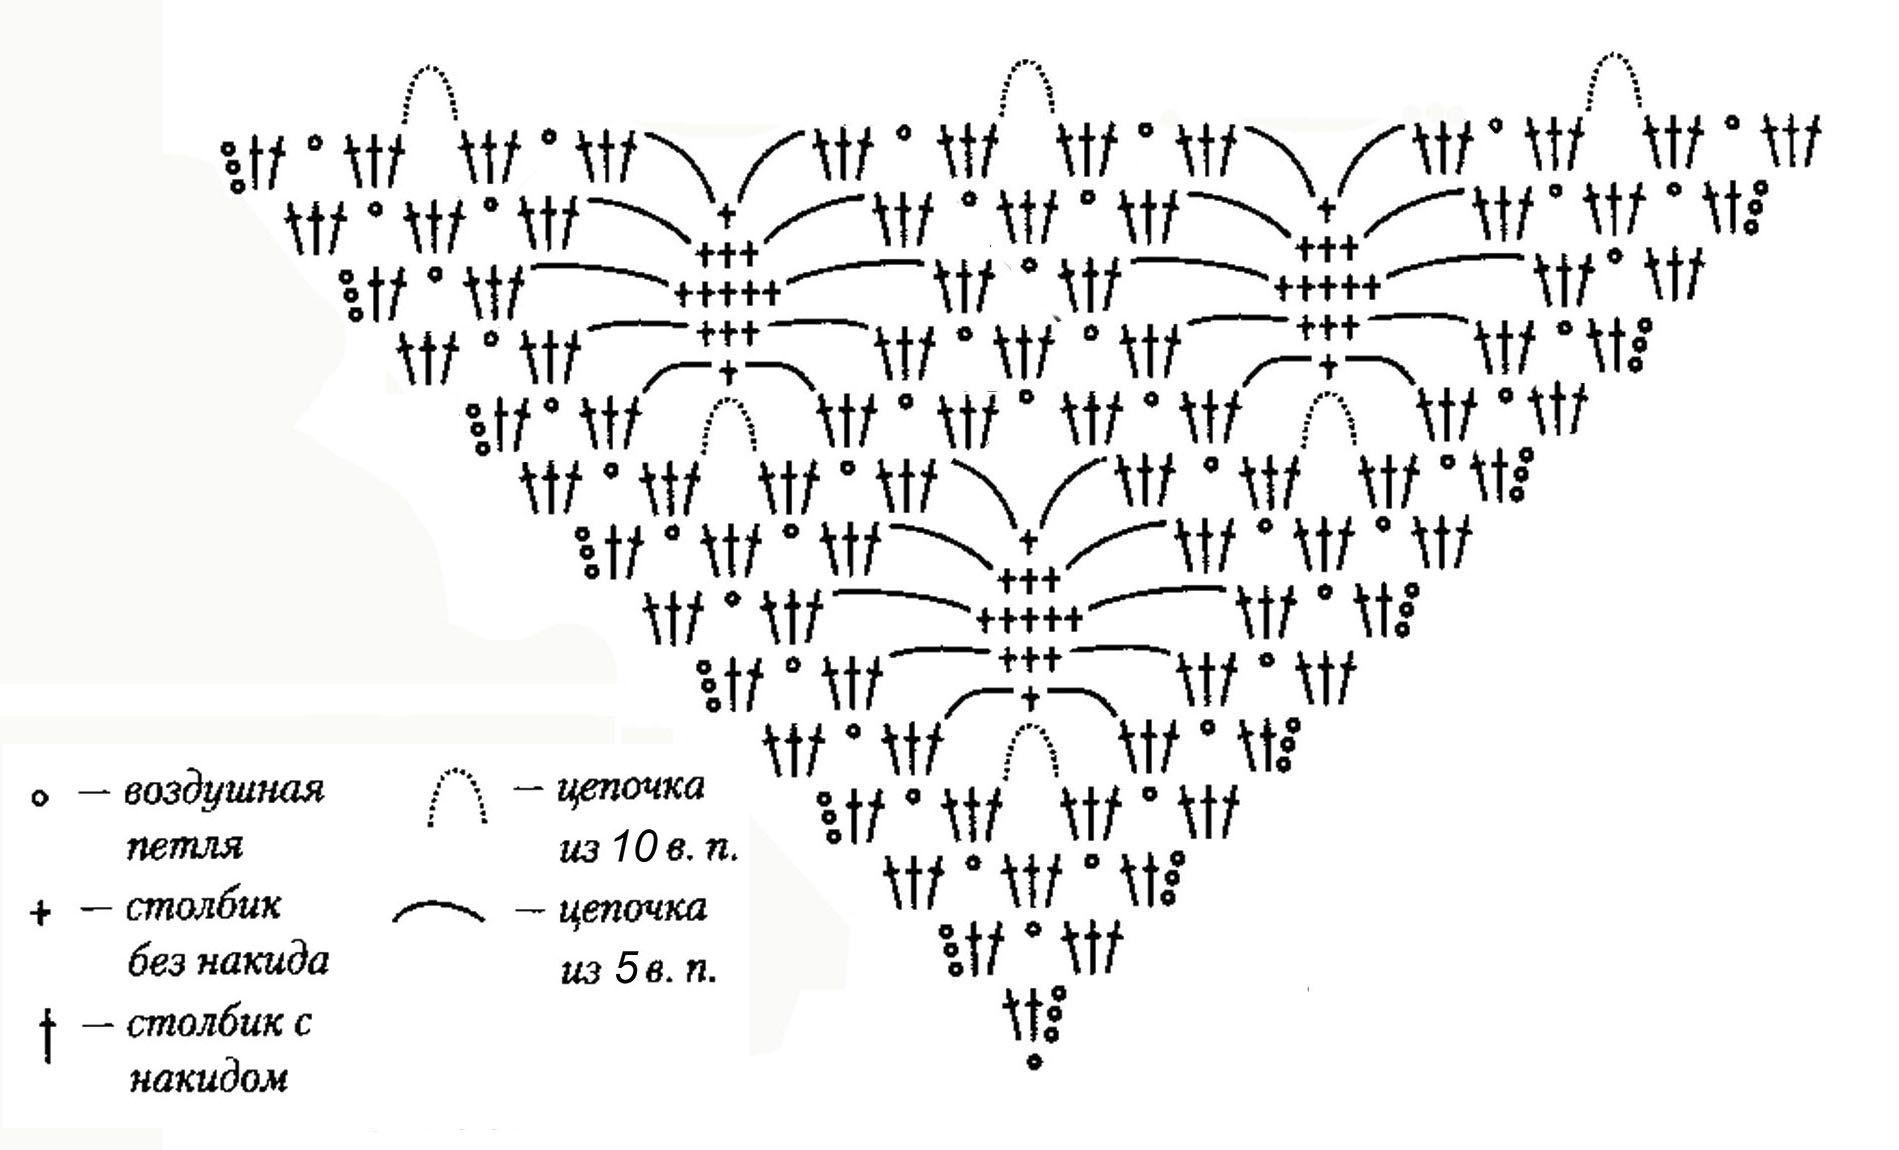 crochet schemi gratis - Cerca con Google | crochet | Pinterest | Google